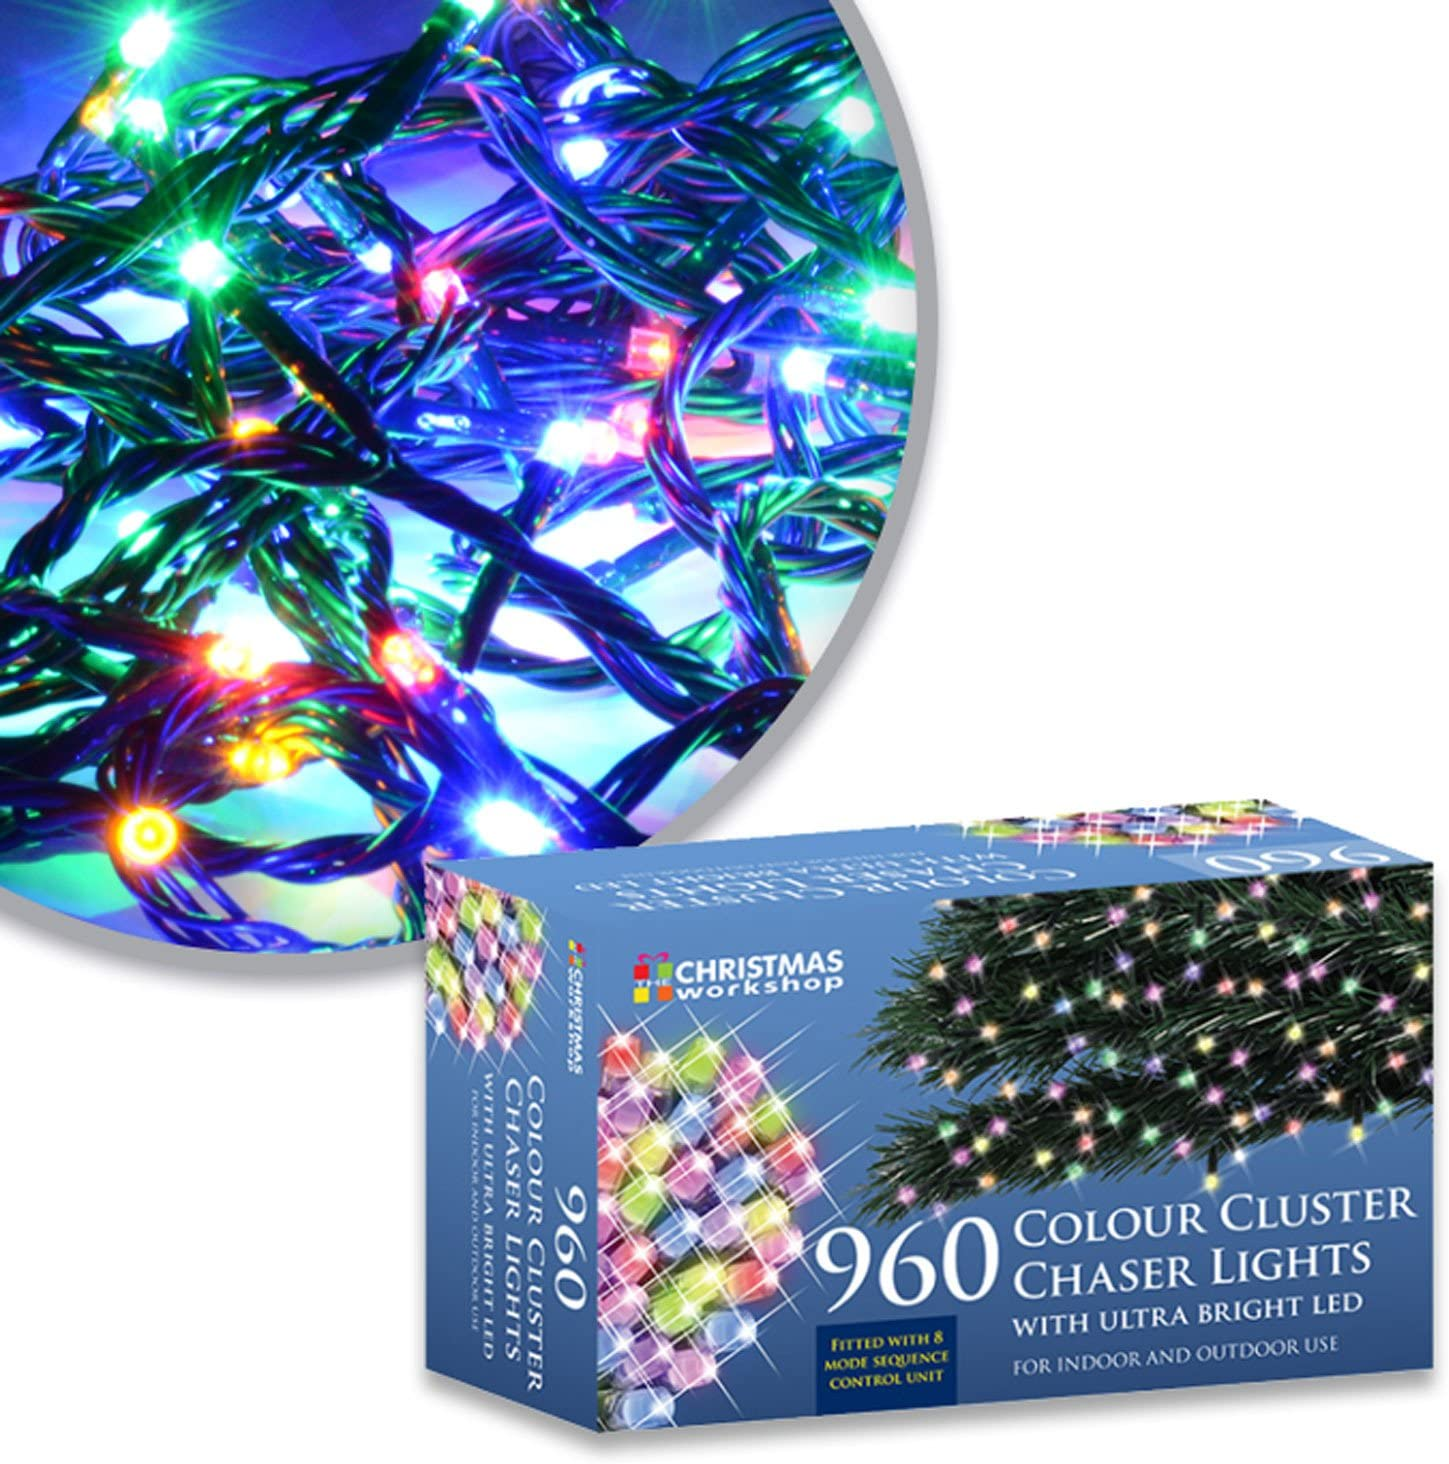 The Christmas Workshop 960 LED Chaser Cluster String Lights Warm White